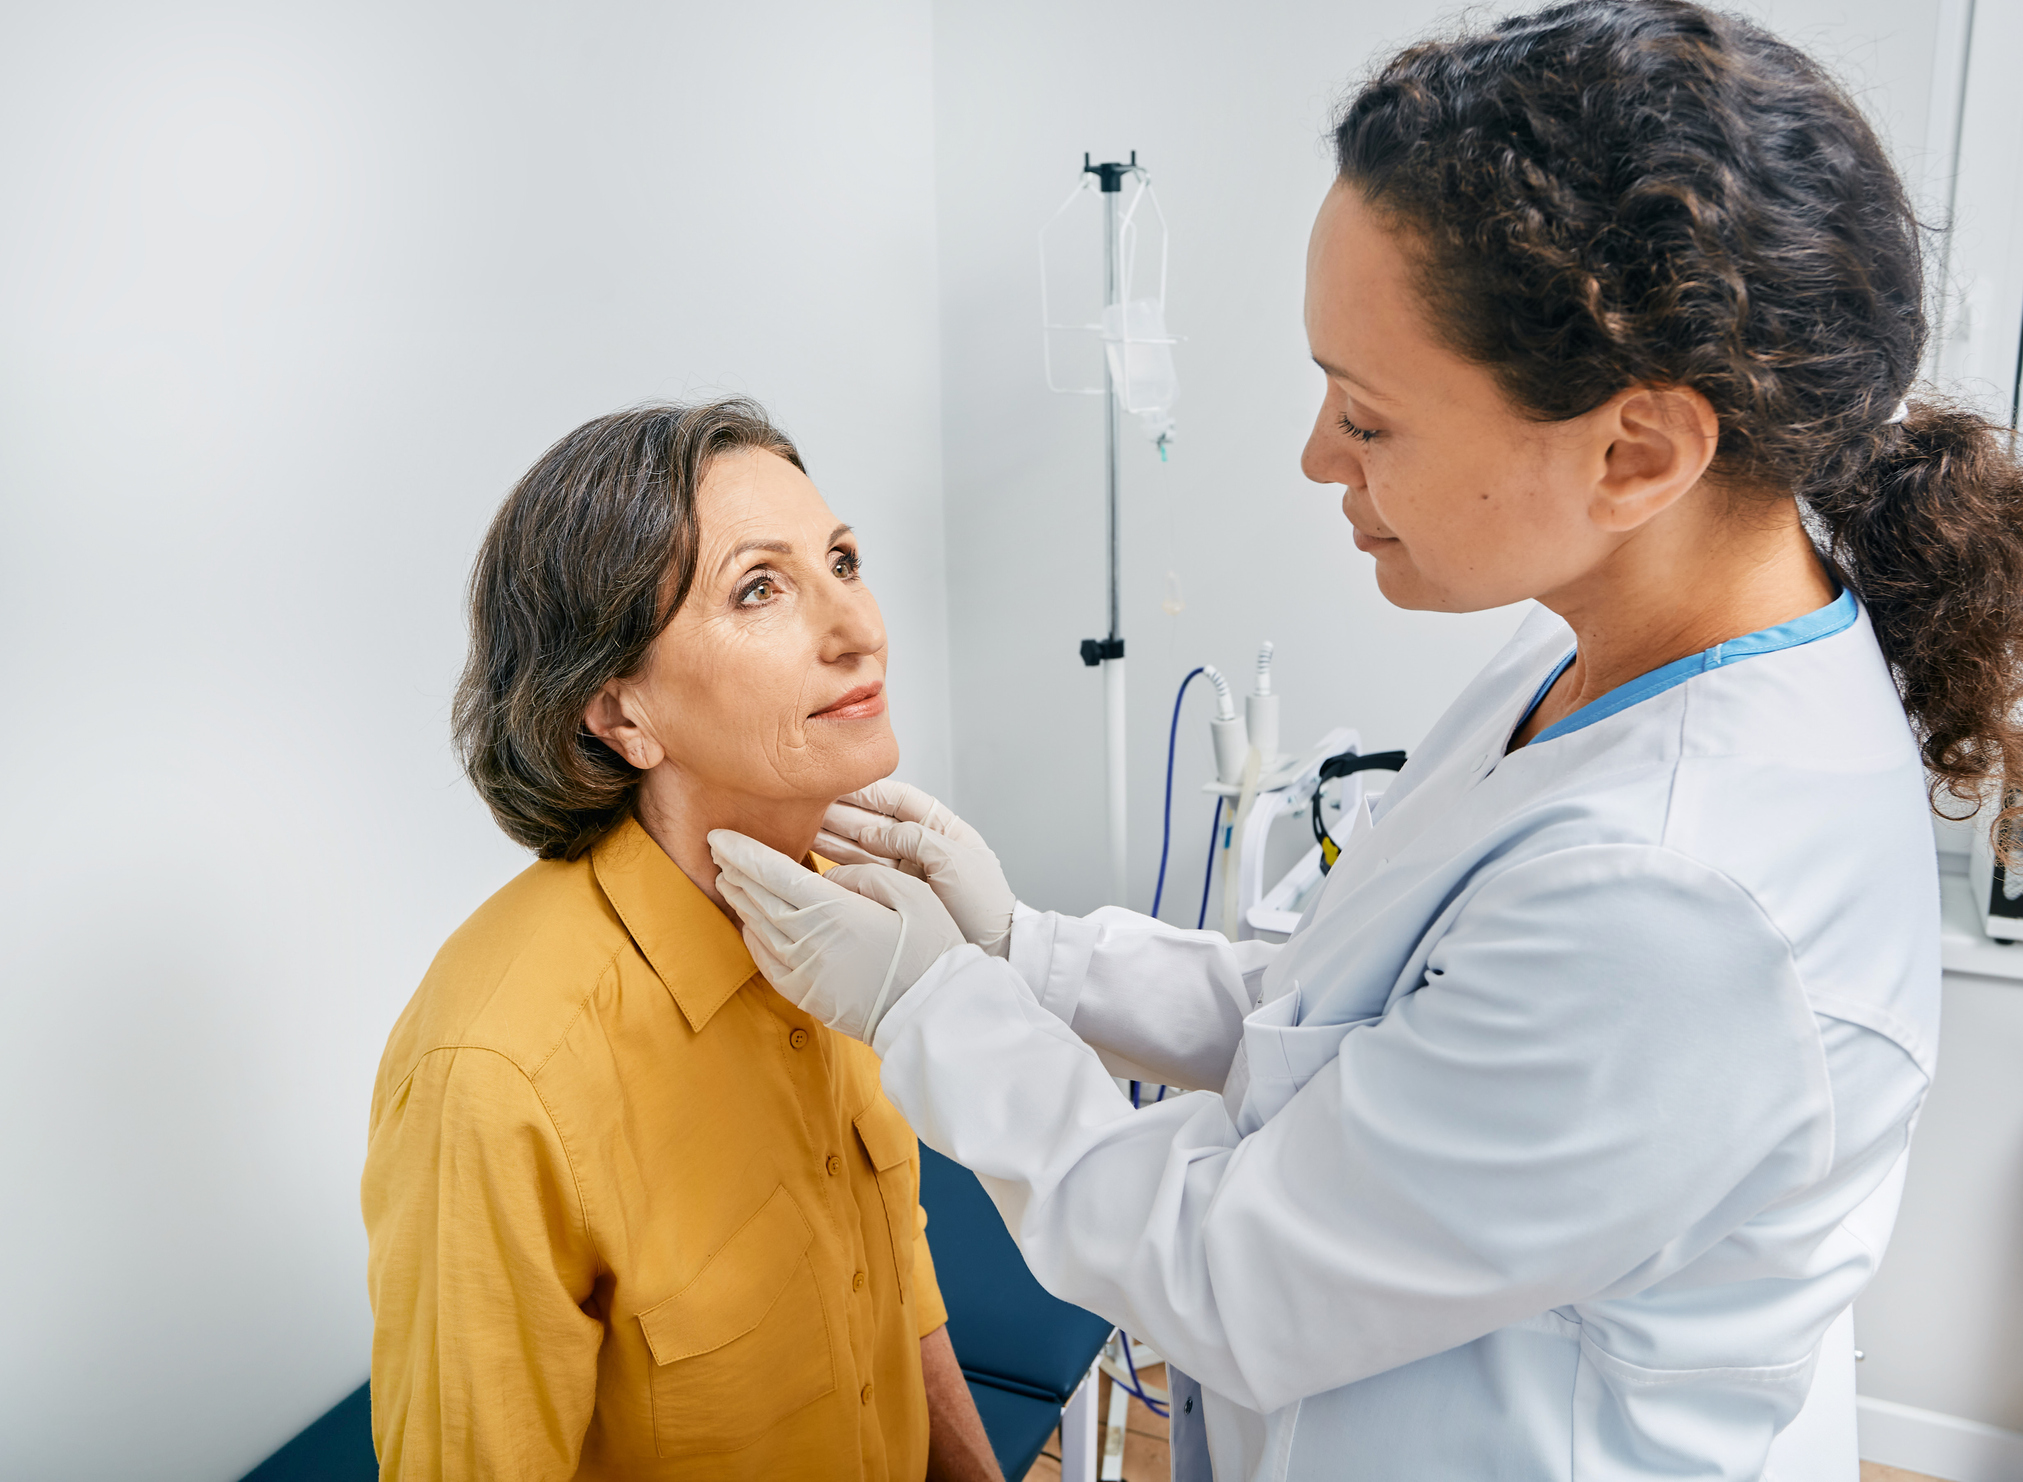 examination for iodine deficiency